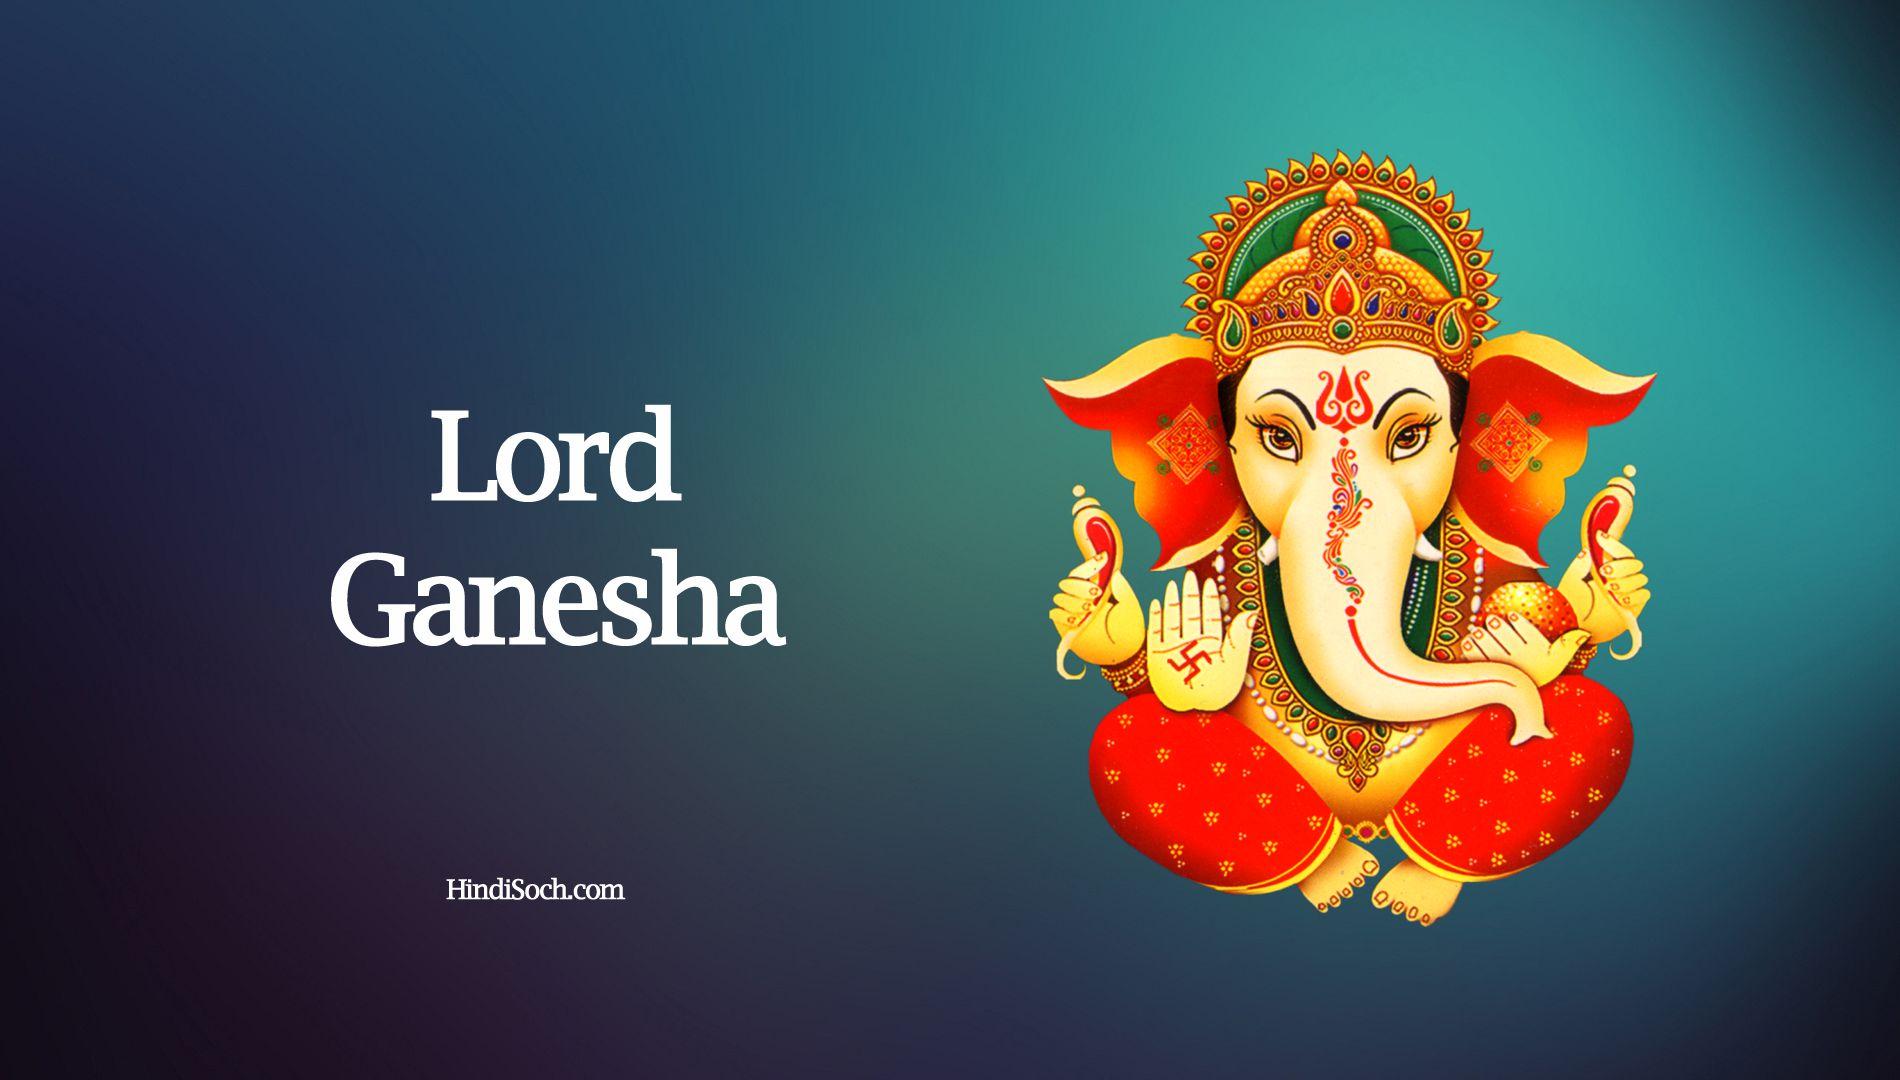 Ganpati Bappa Wallpaper Hd 3d 1 418 Beautiful Lord Ganesha Hd Images Photos Ganesh Ji